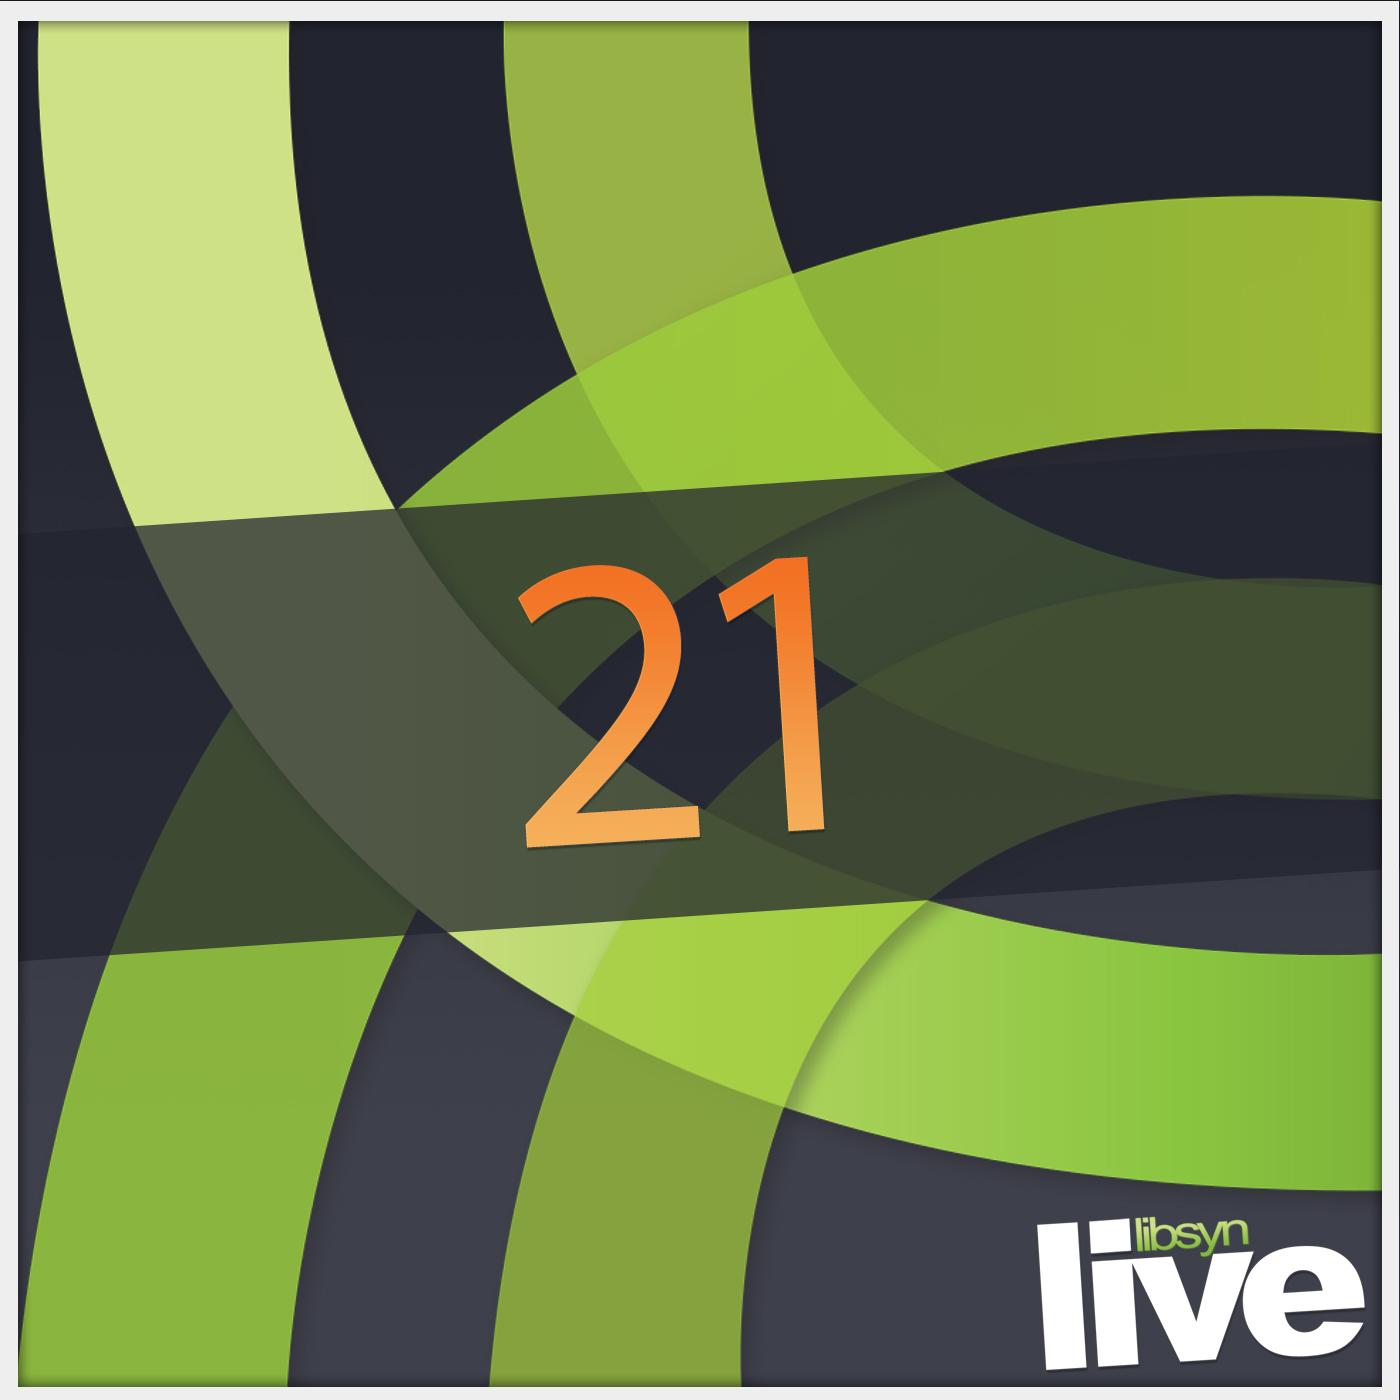 Libsyn Live Event #0021